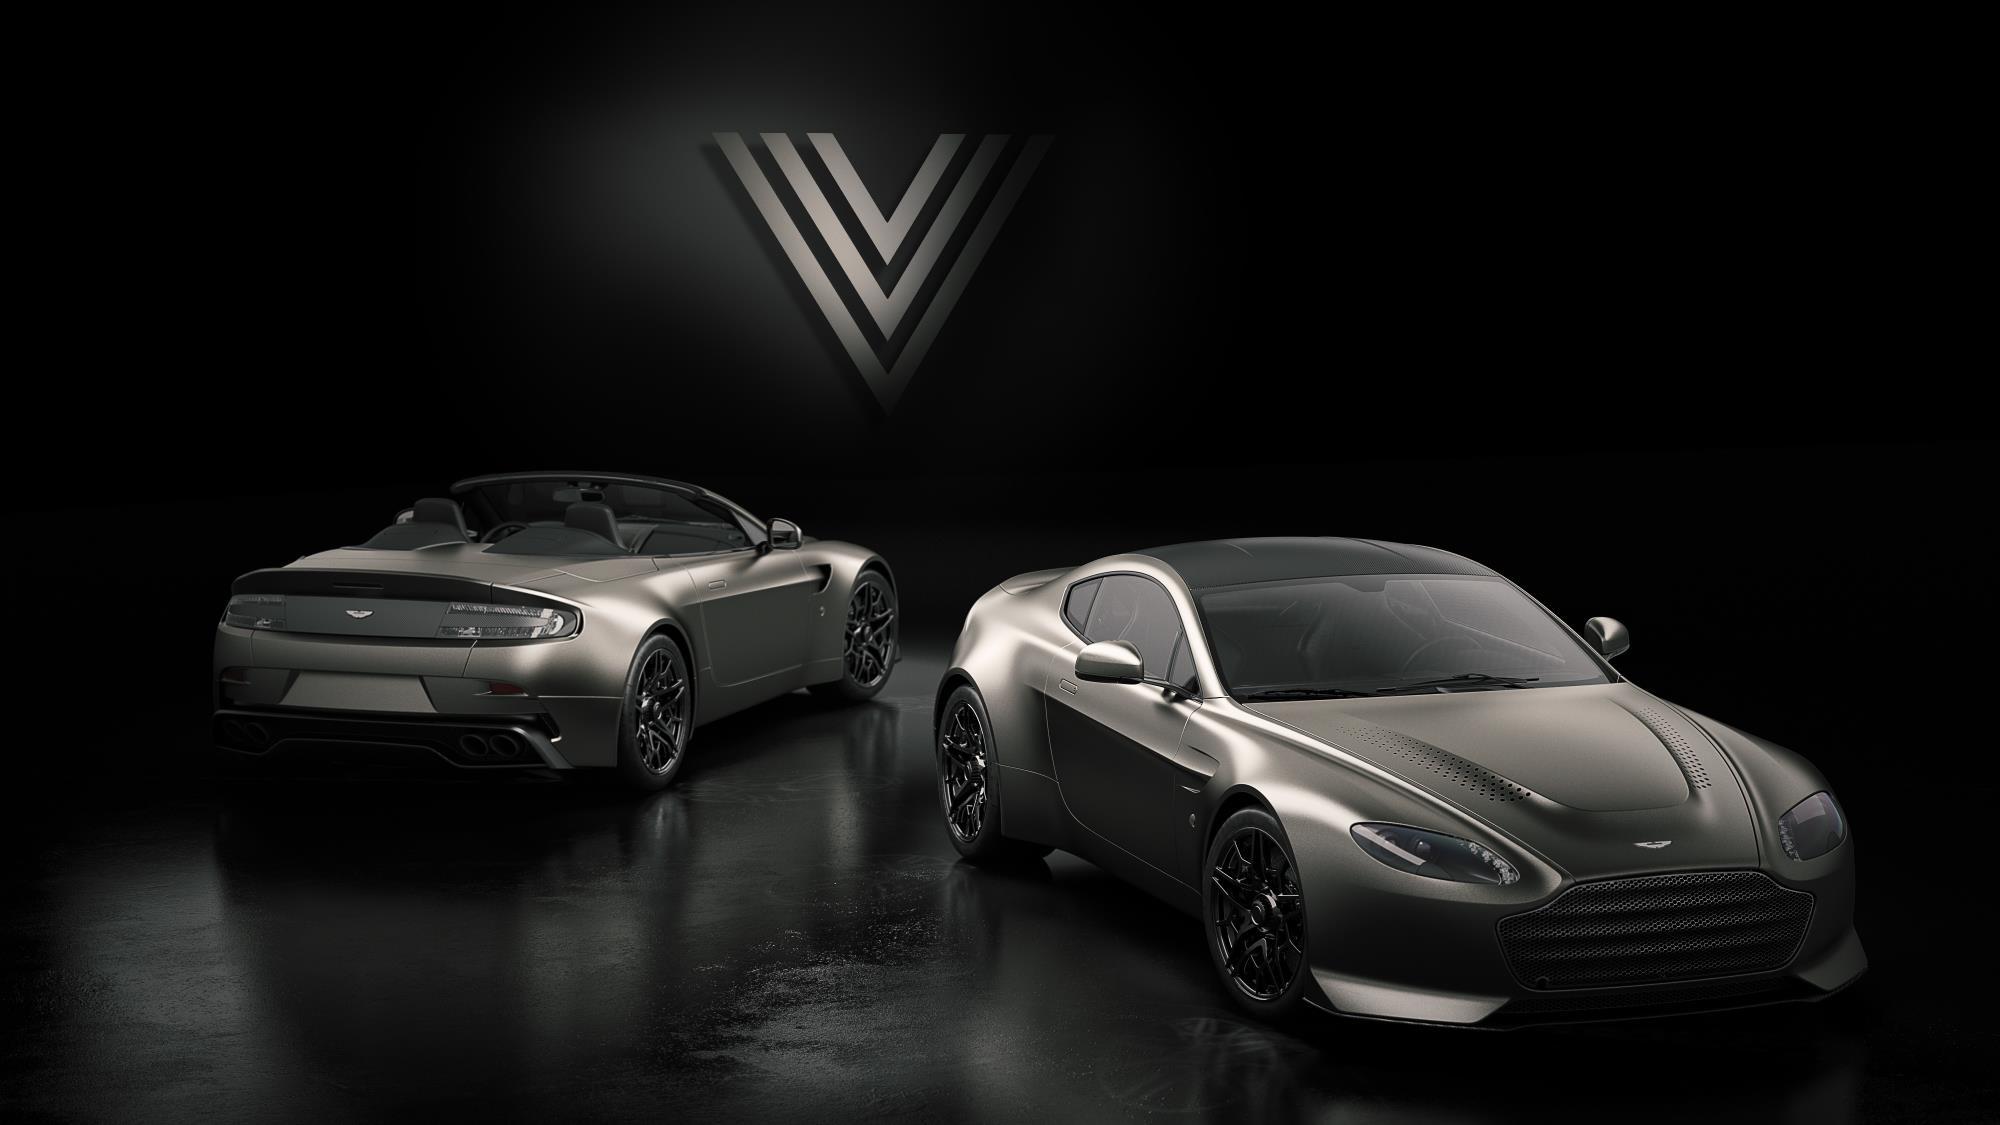 Aston Martin V12 Vantage V600 Edition Recreates An Icon